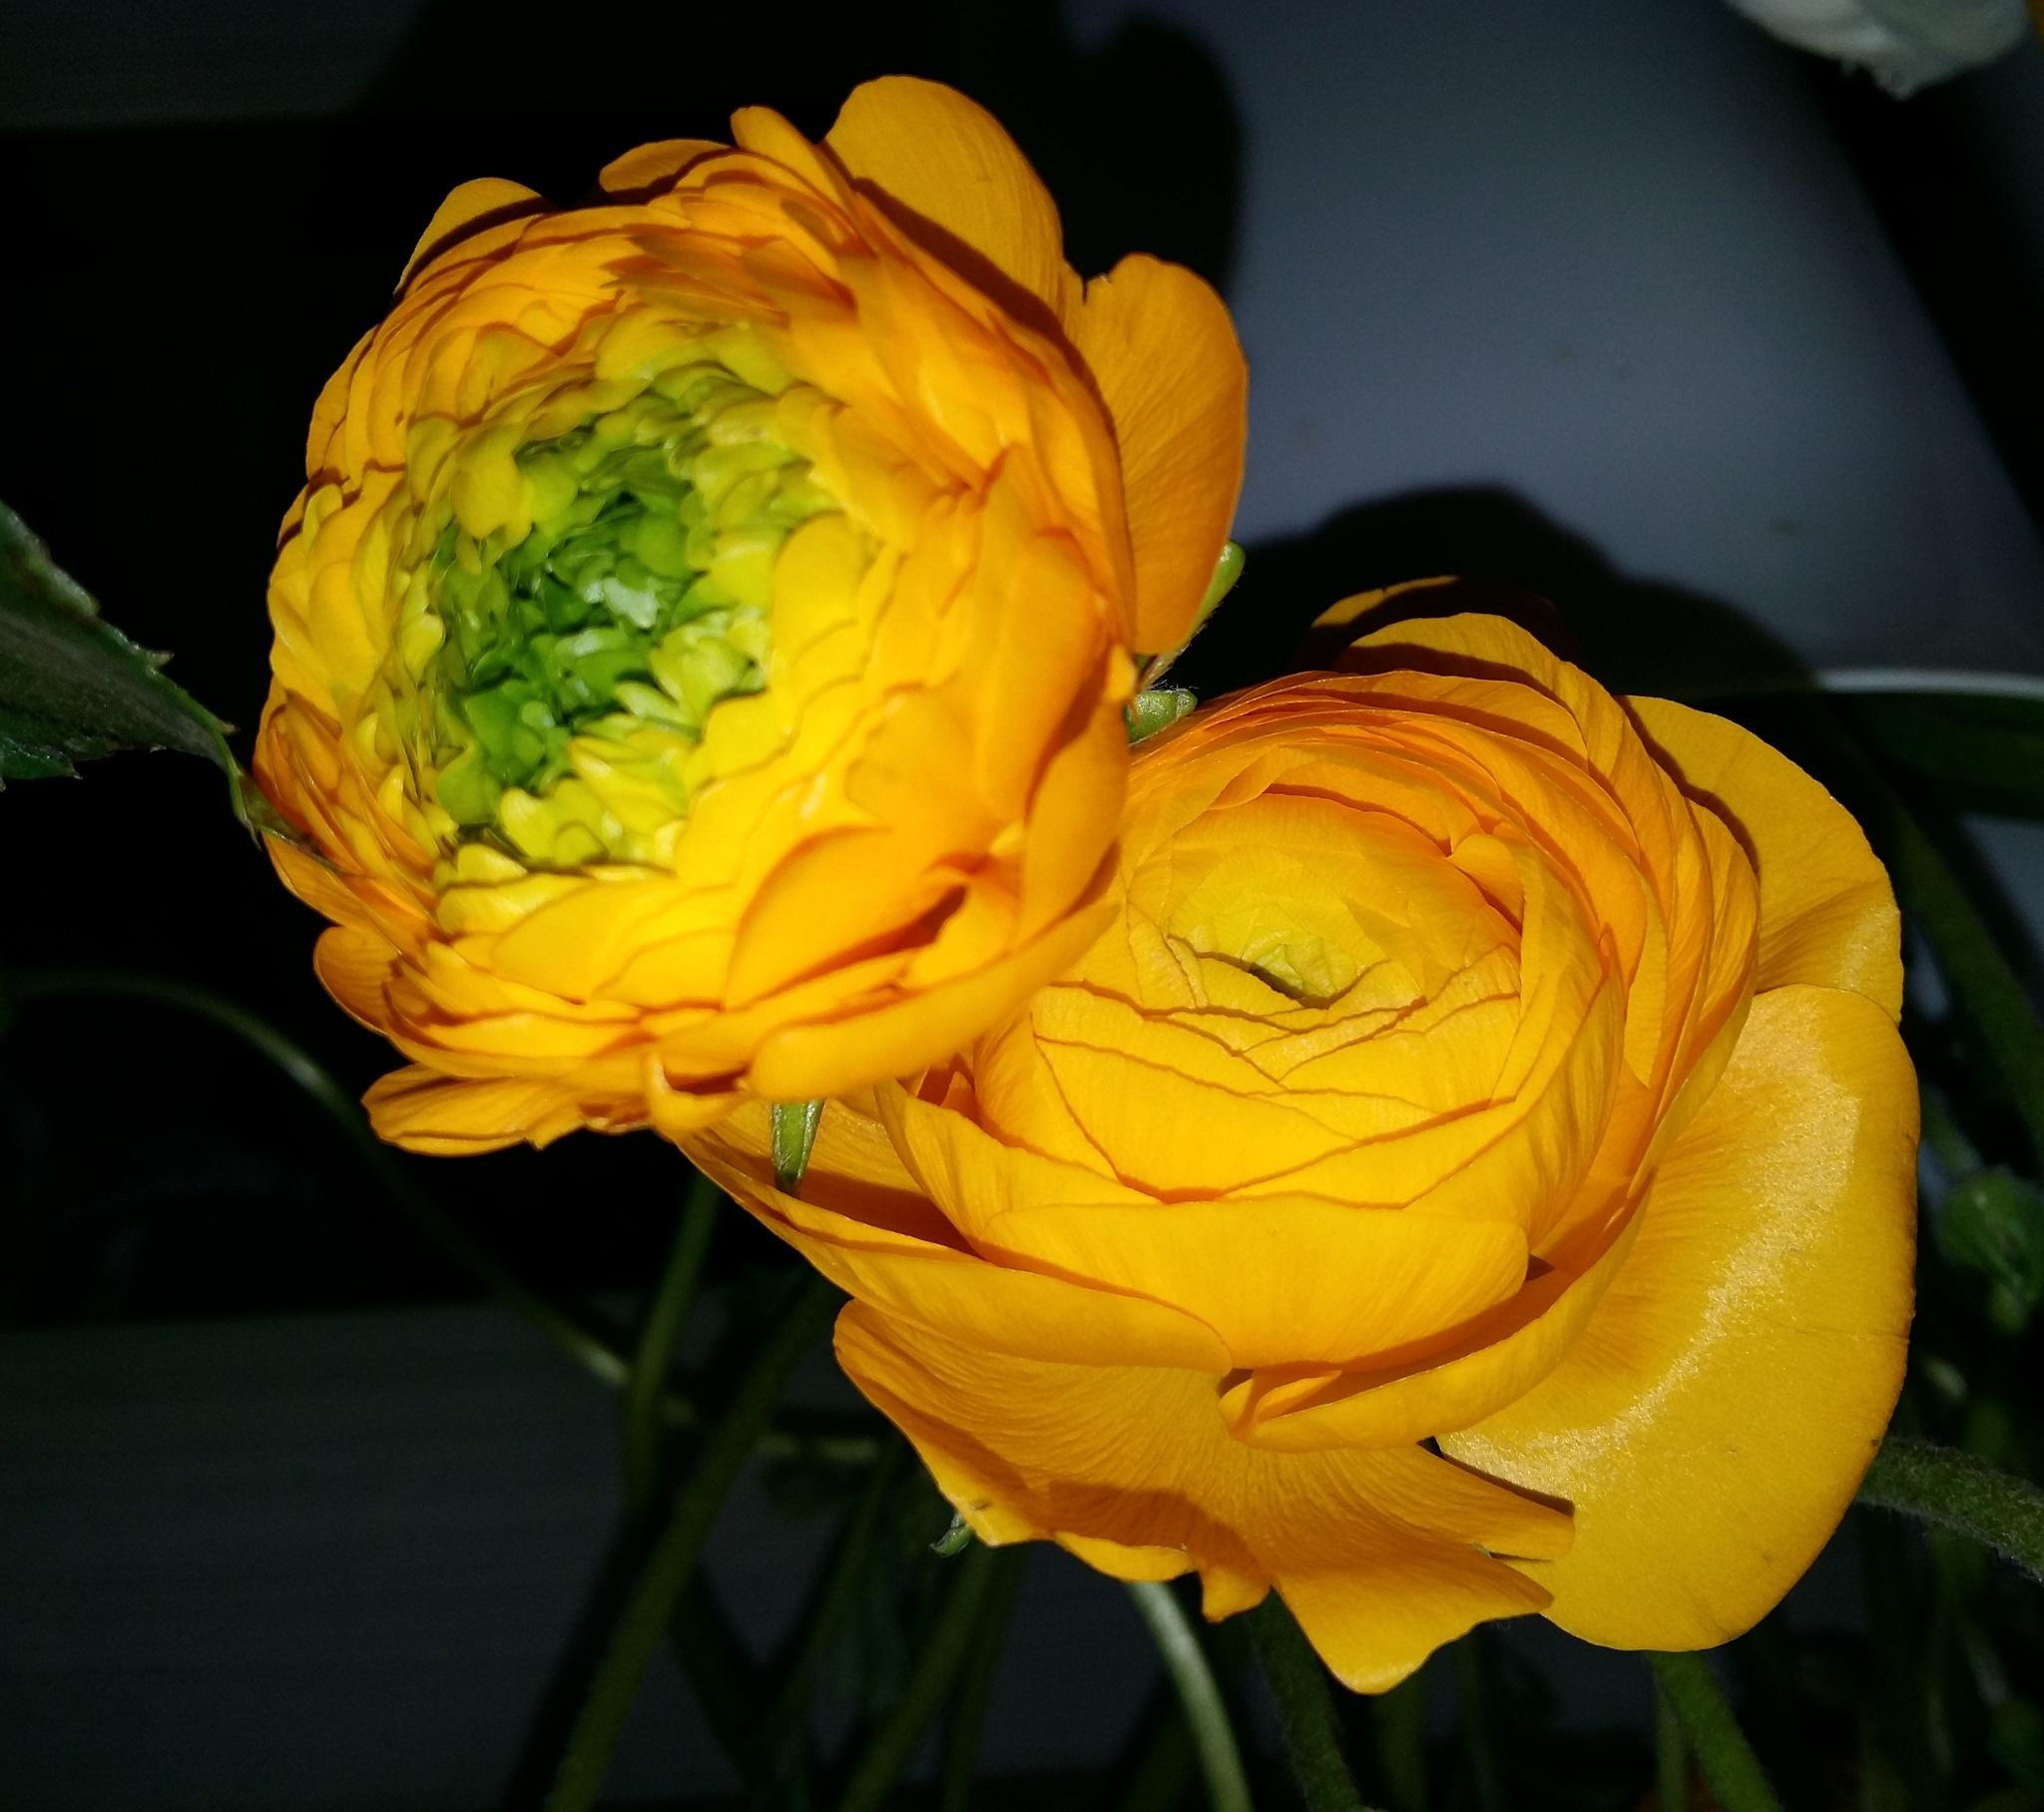 Two flowers by uzkuraitiene62